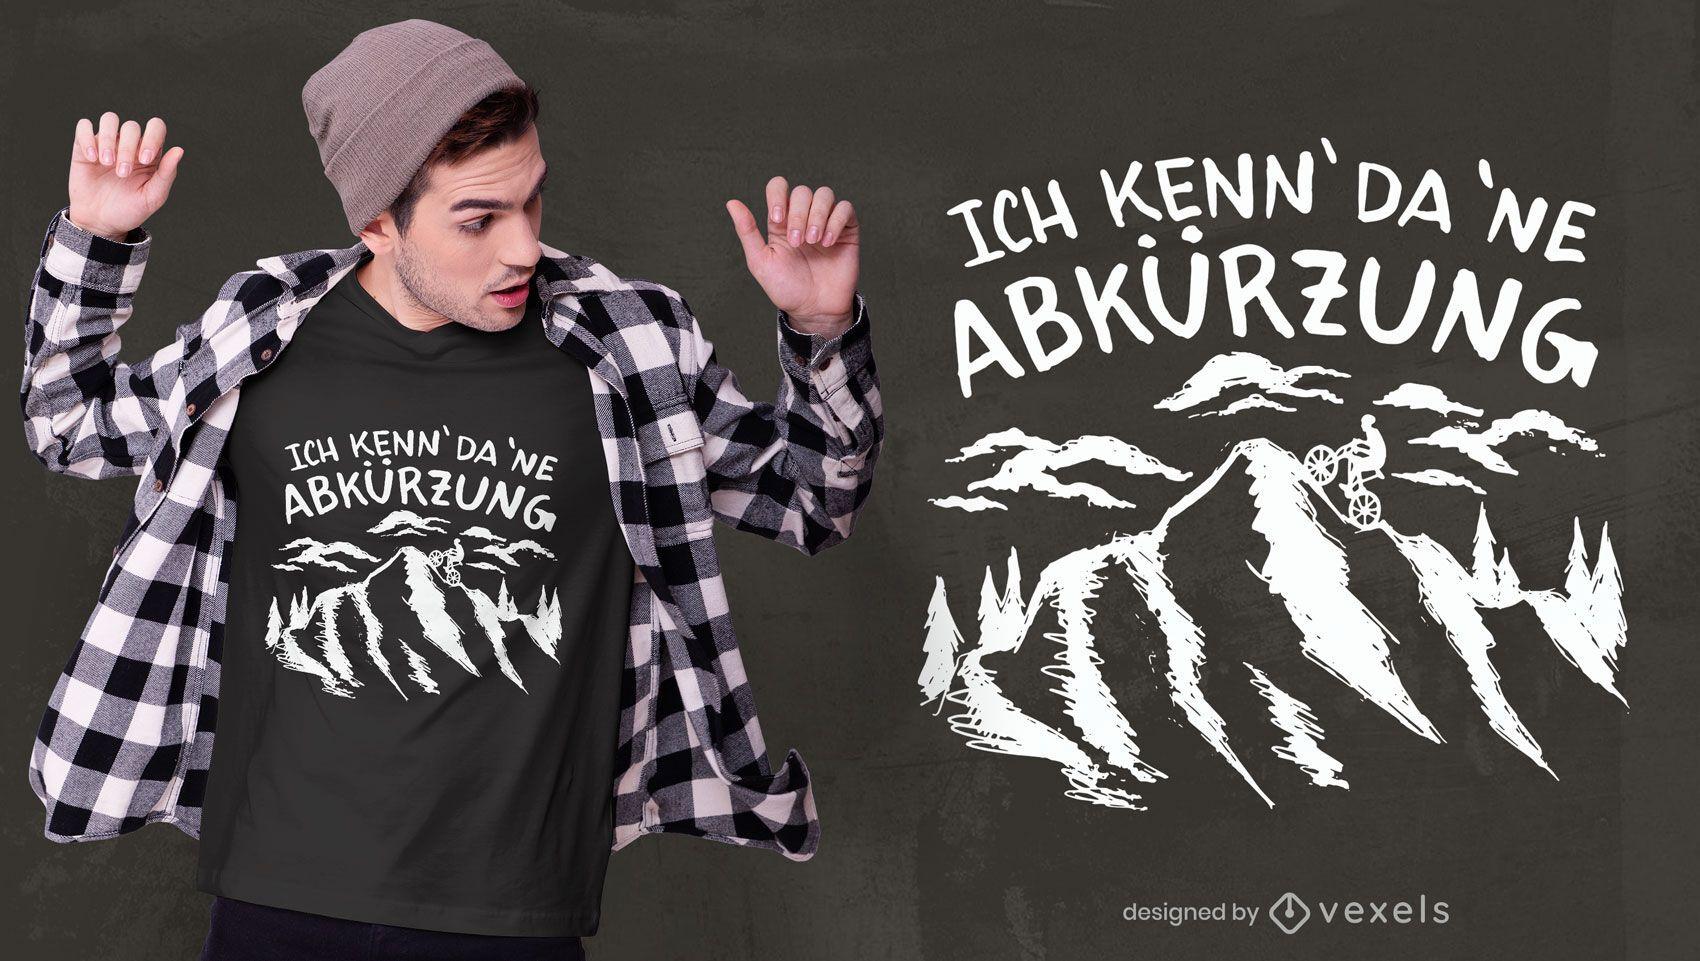 Uphill biker quote t-shirt design